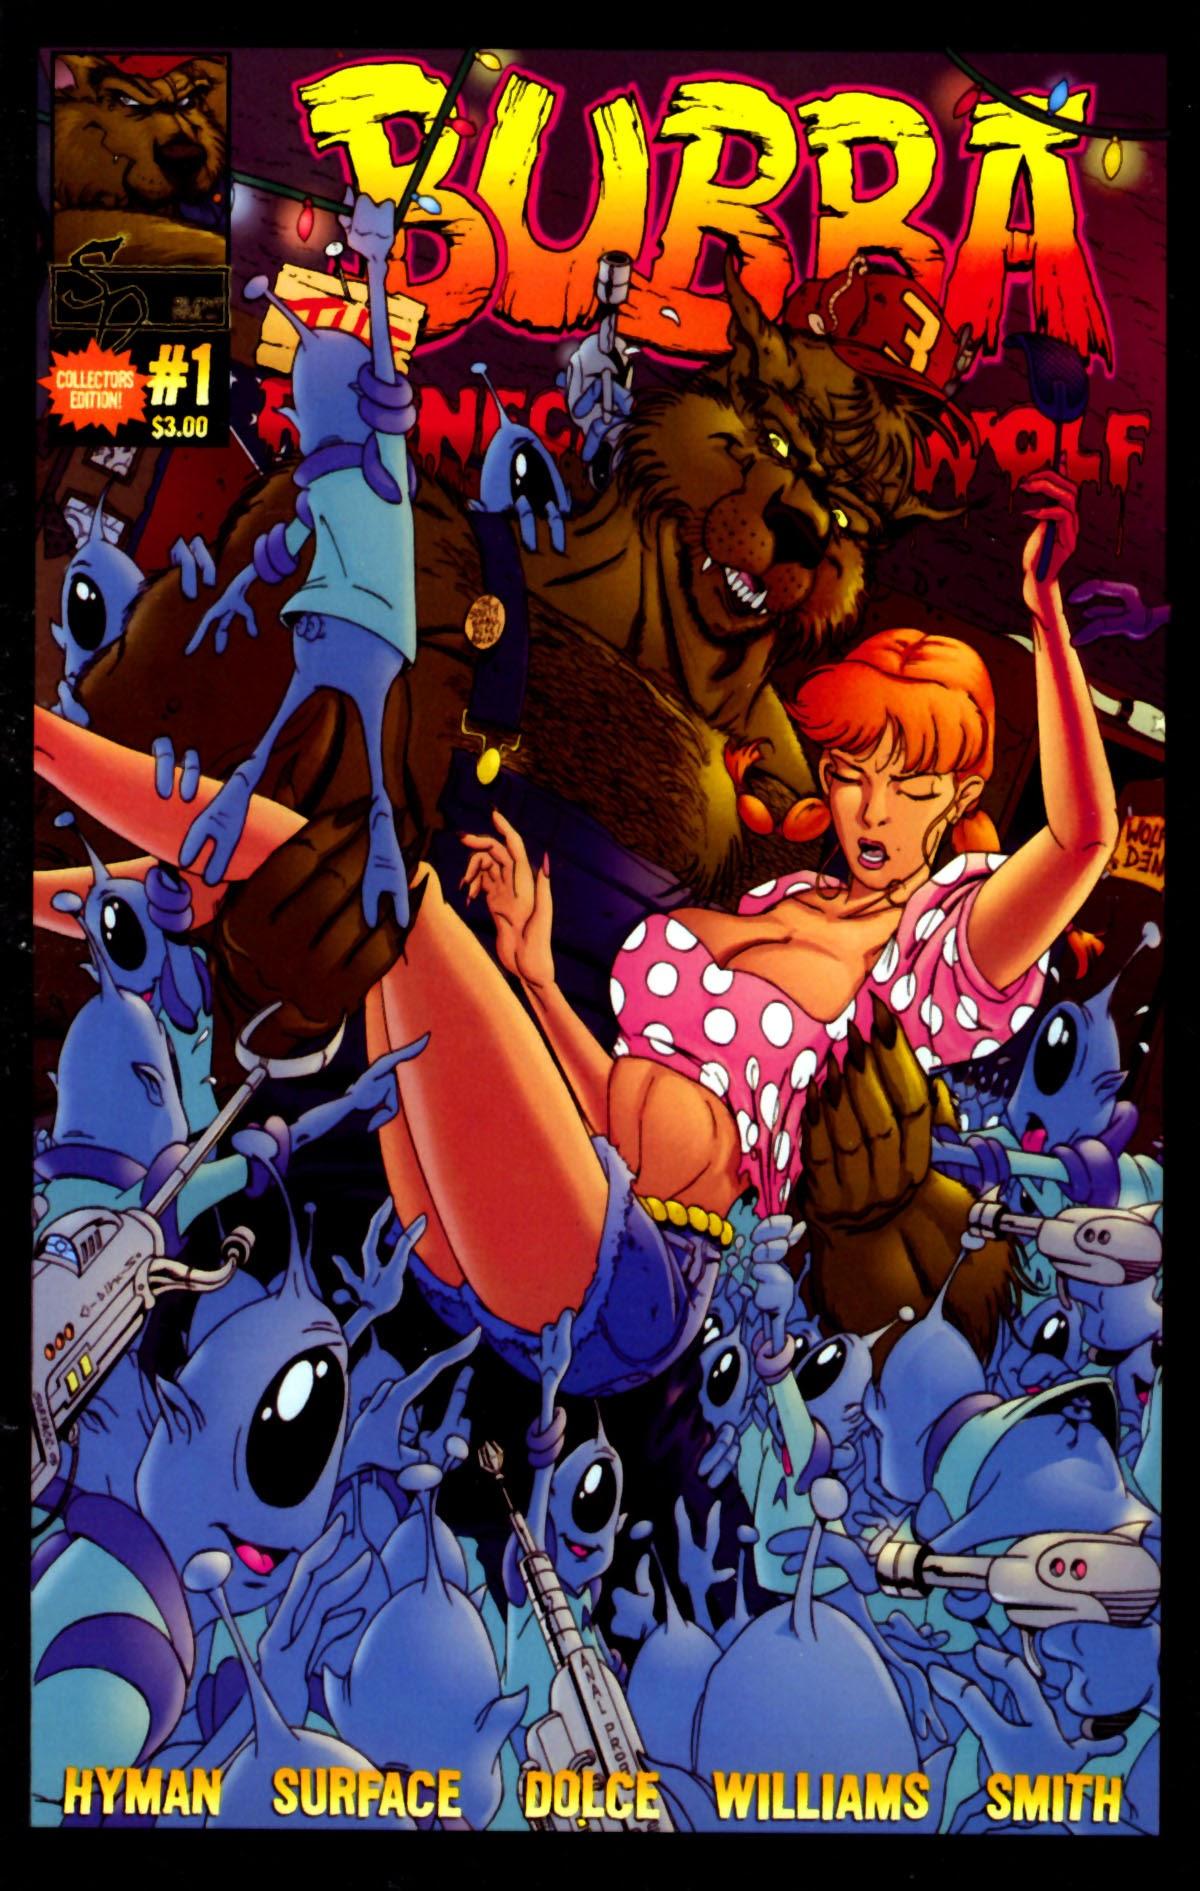 Bubba the Redneck Werewolf Super Sci-fi Special Full Page 1